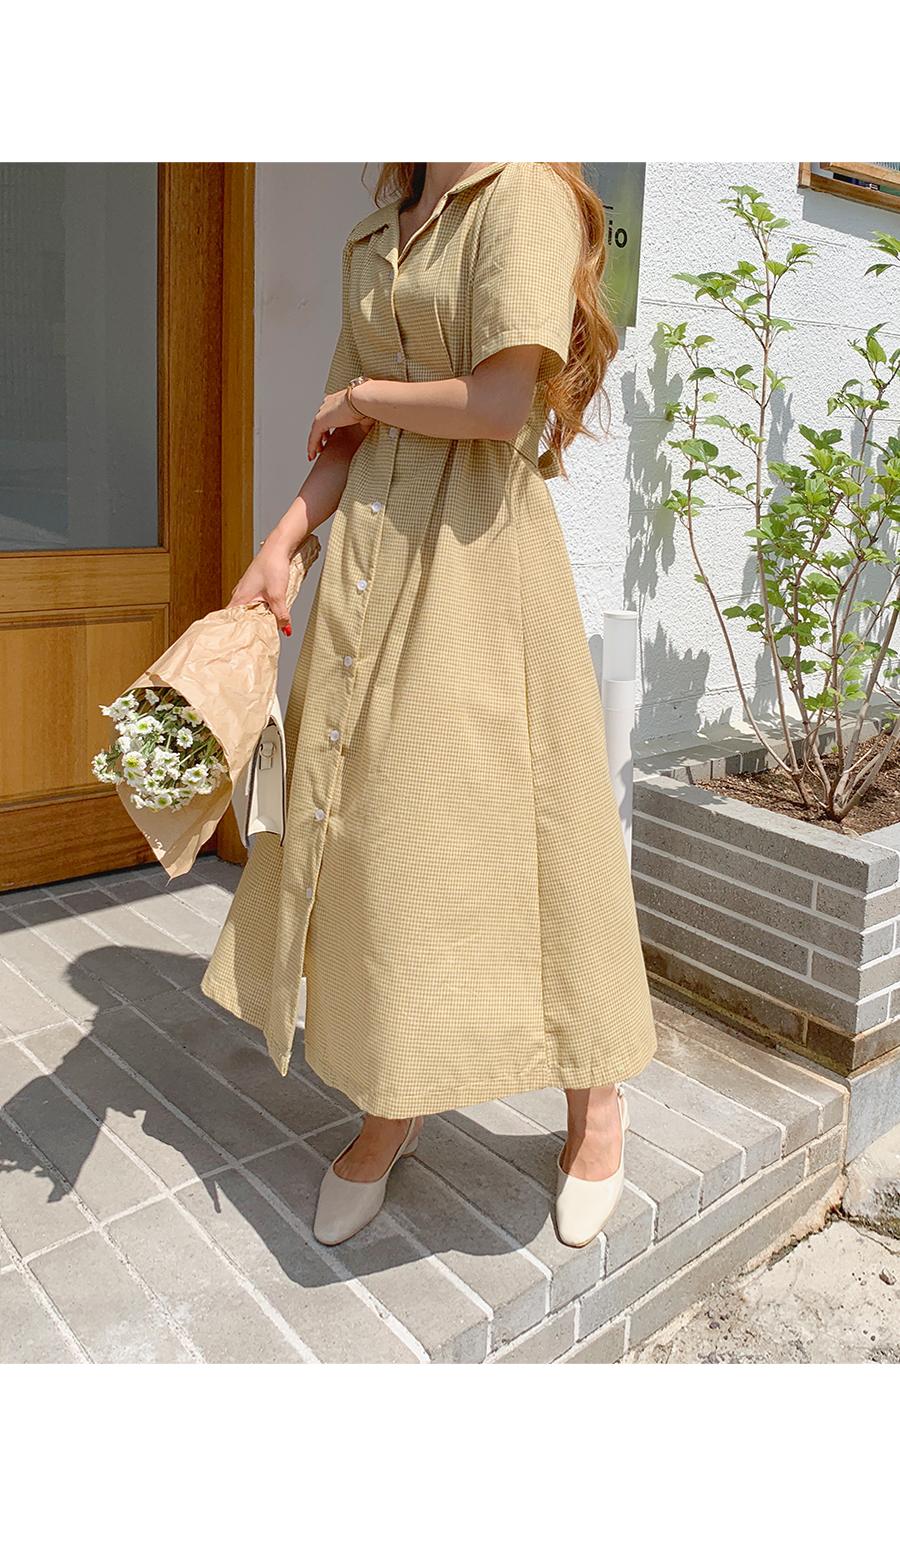 Planetzan Check Collar Neck Long Dress